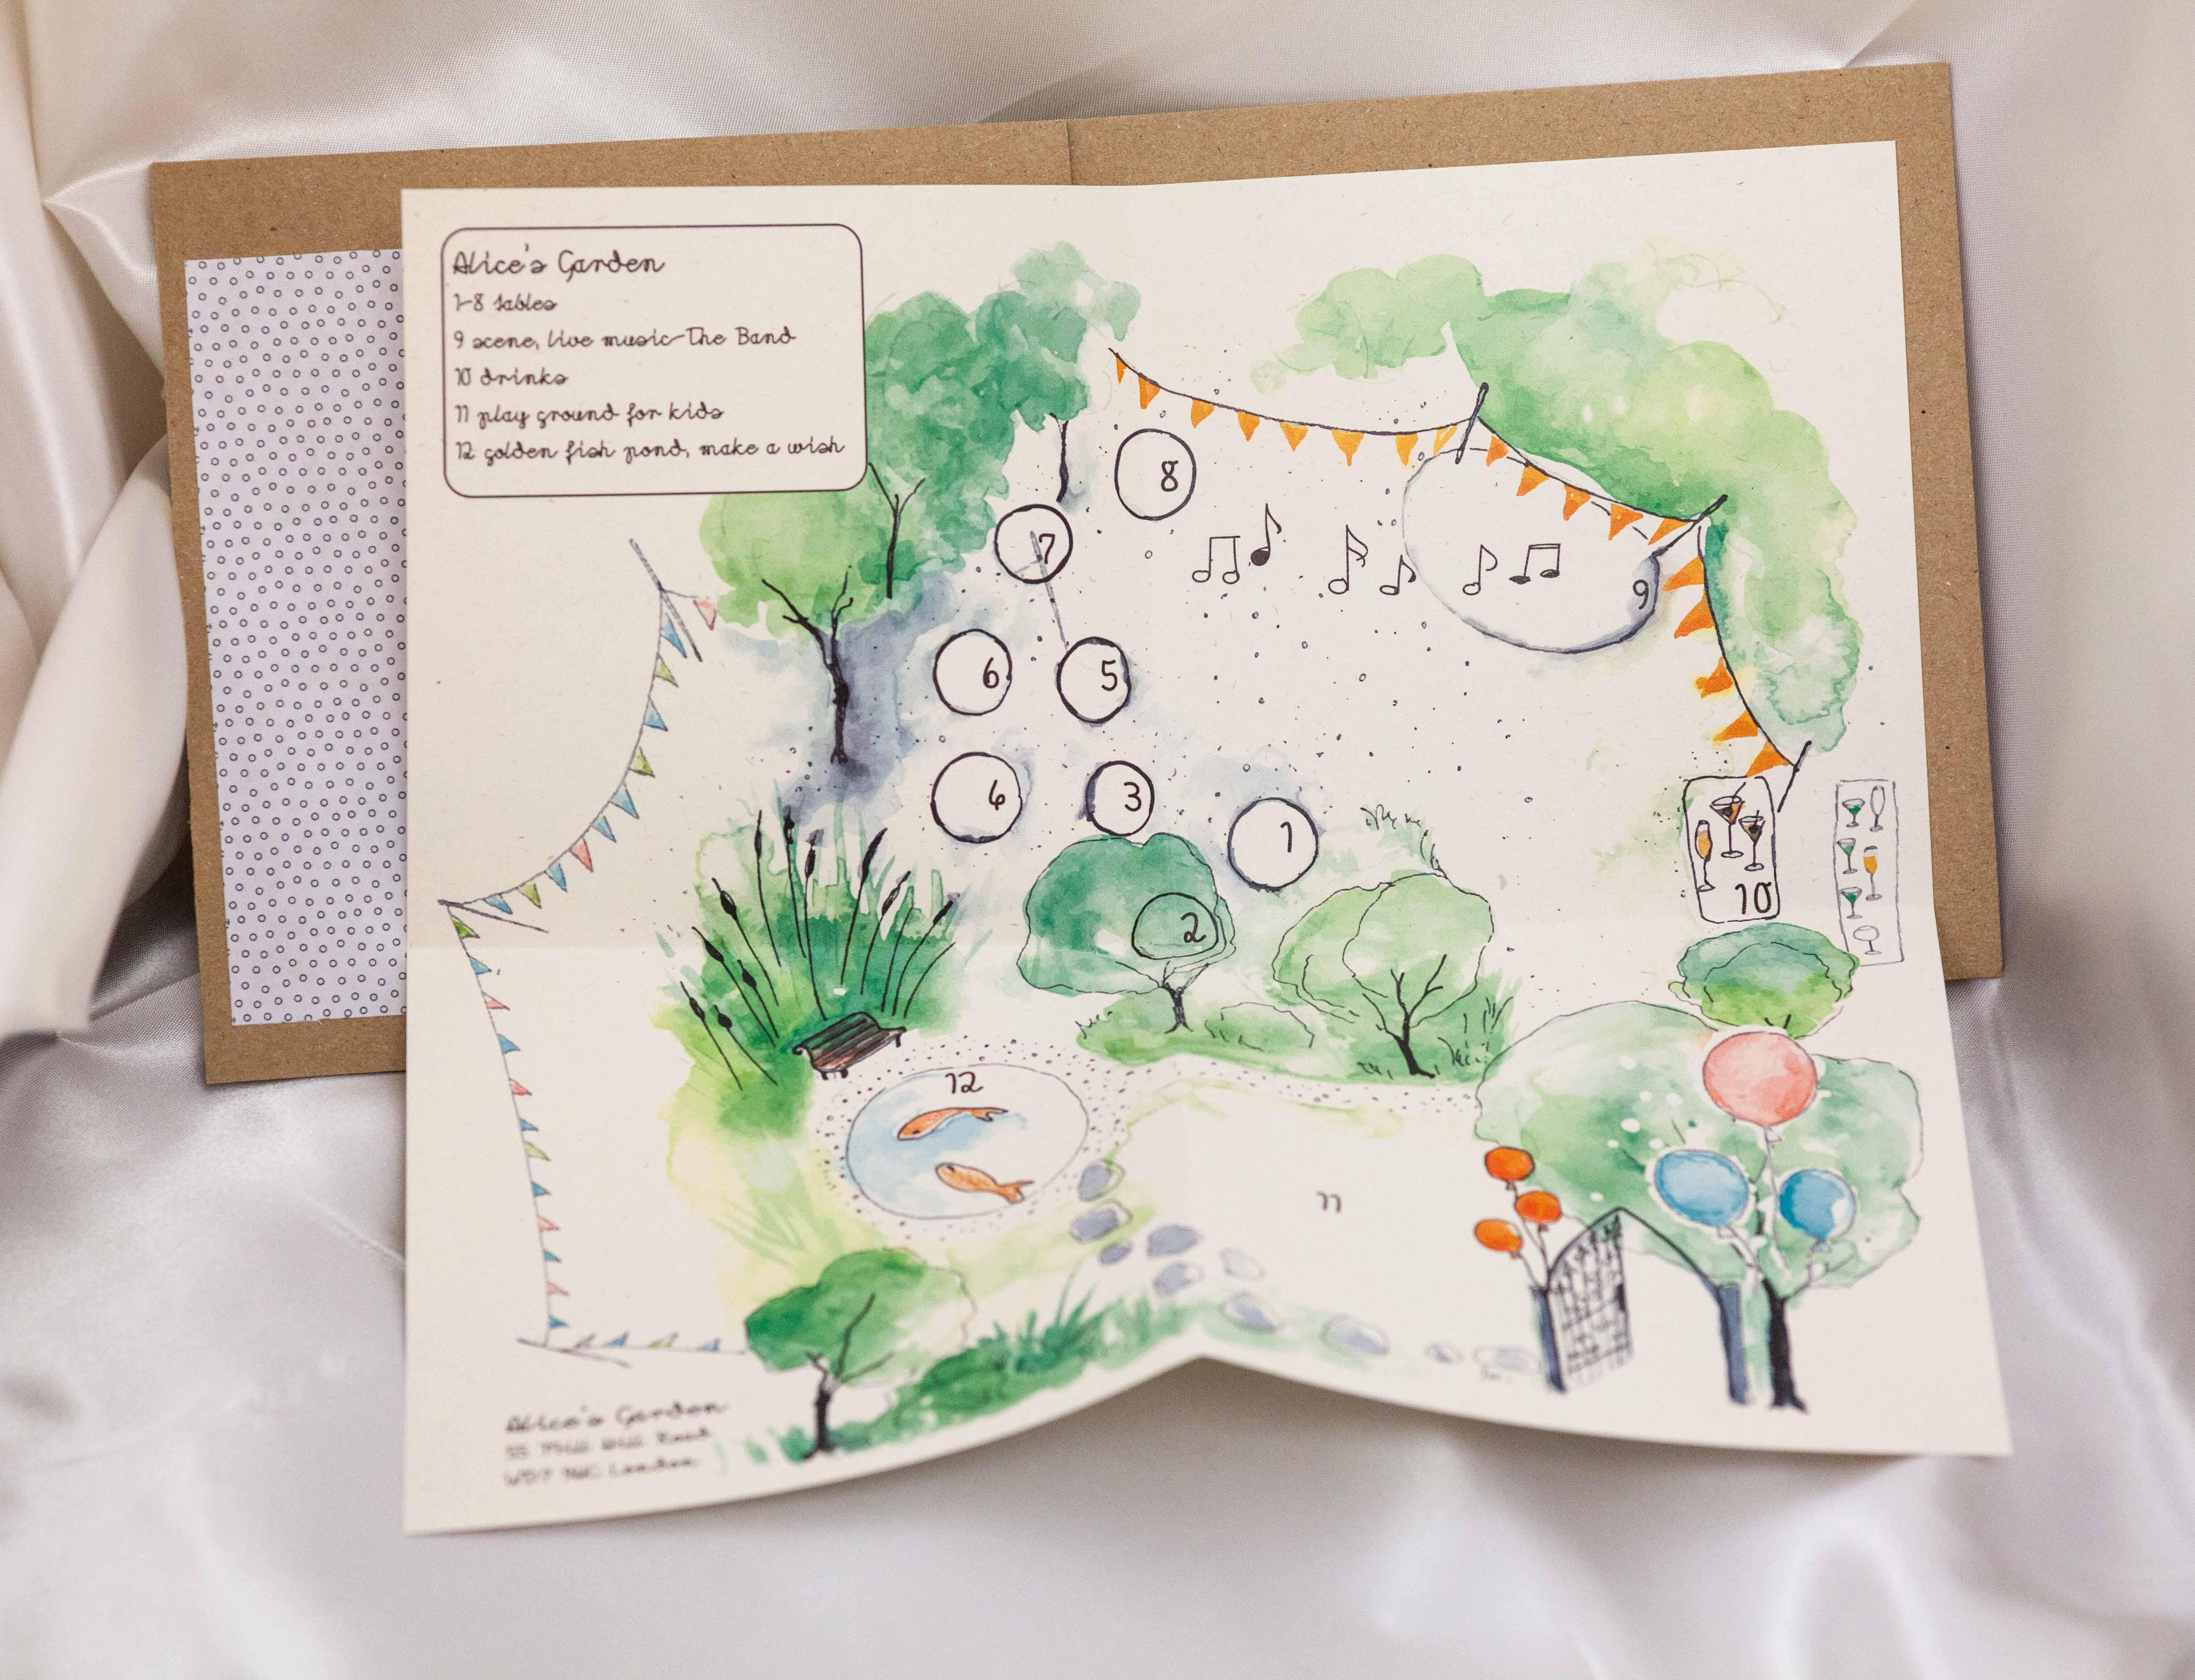 Designed and printed invitation